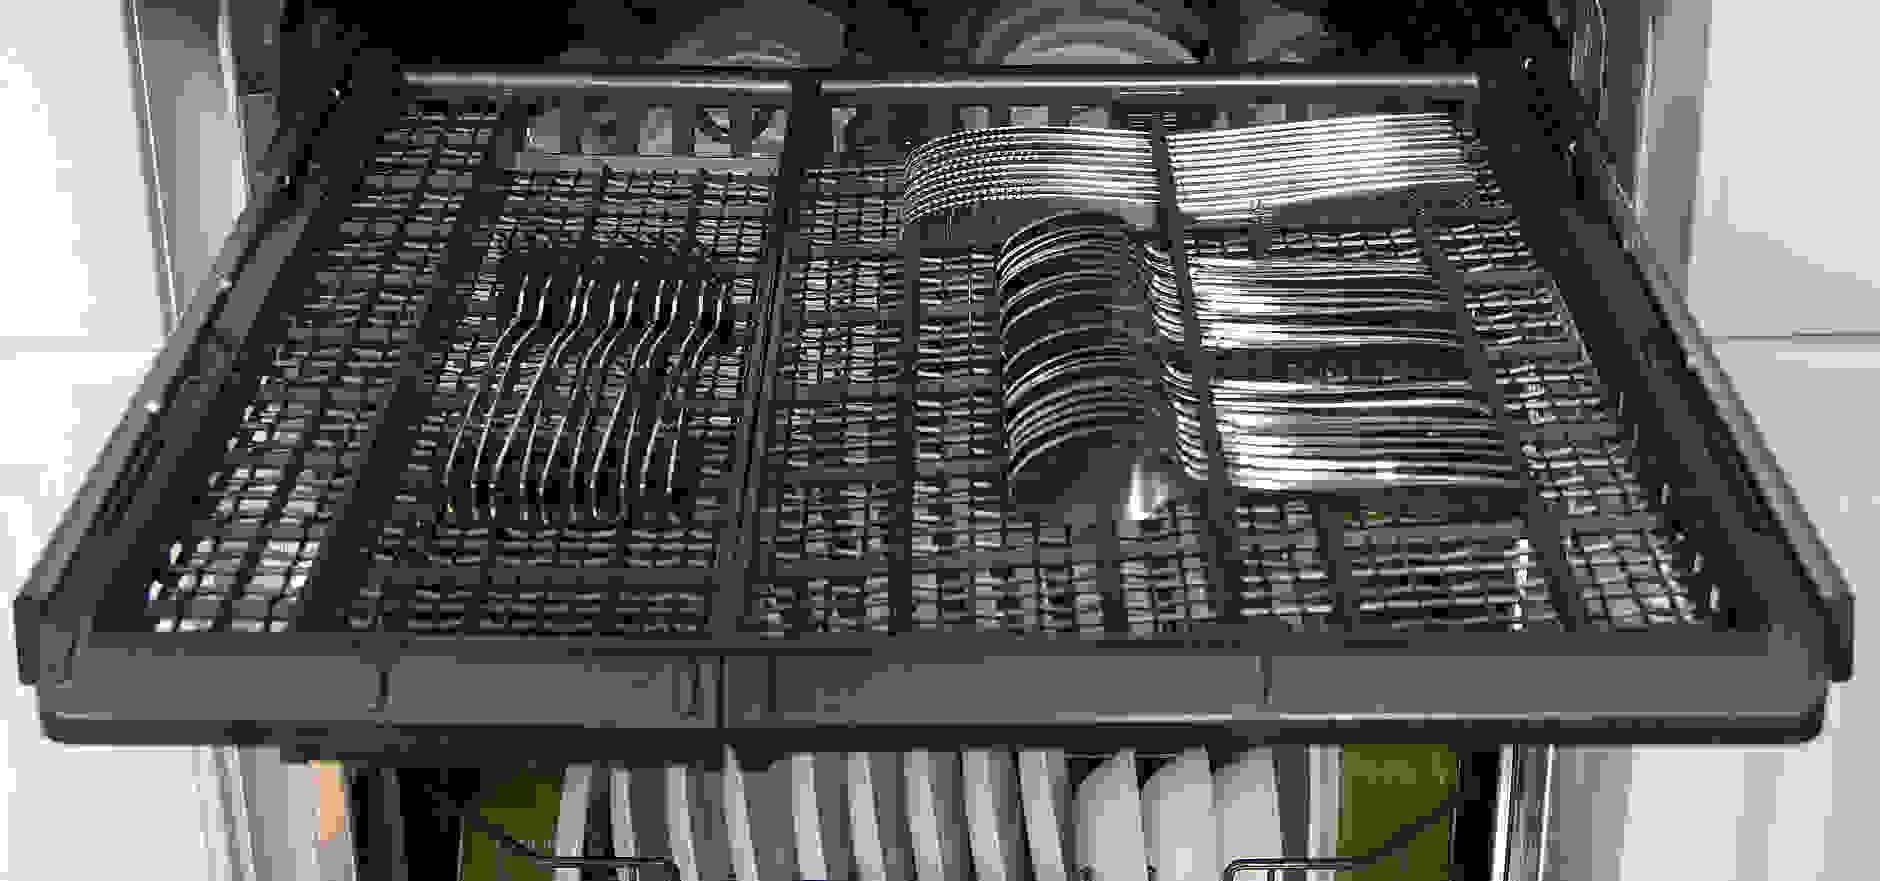 GE Monogram ZDT870SSFSS Cutlery Tray loaded with silverware